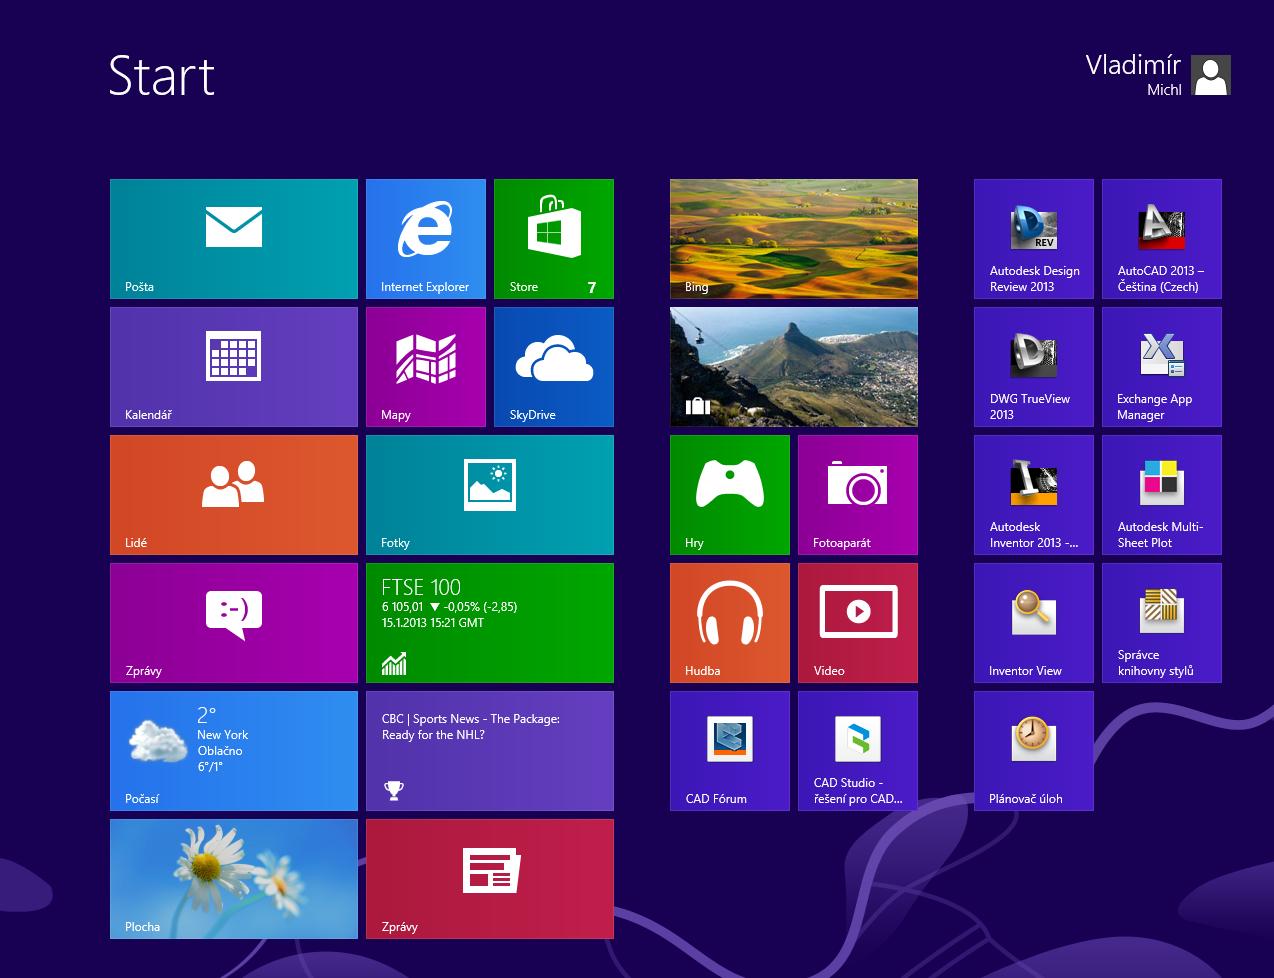 Dwg trueview download for windows 7 64 bit   Autodesk DWG TrueView